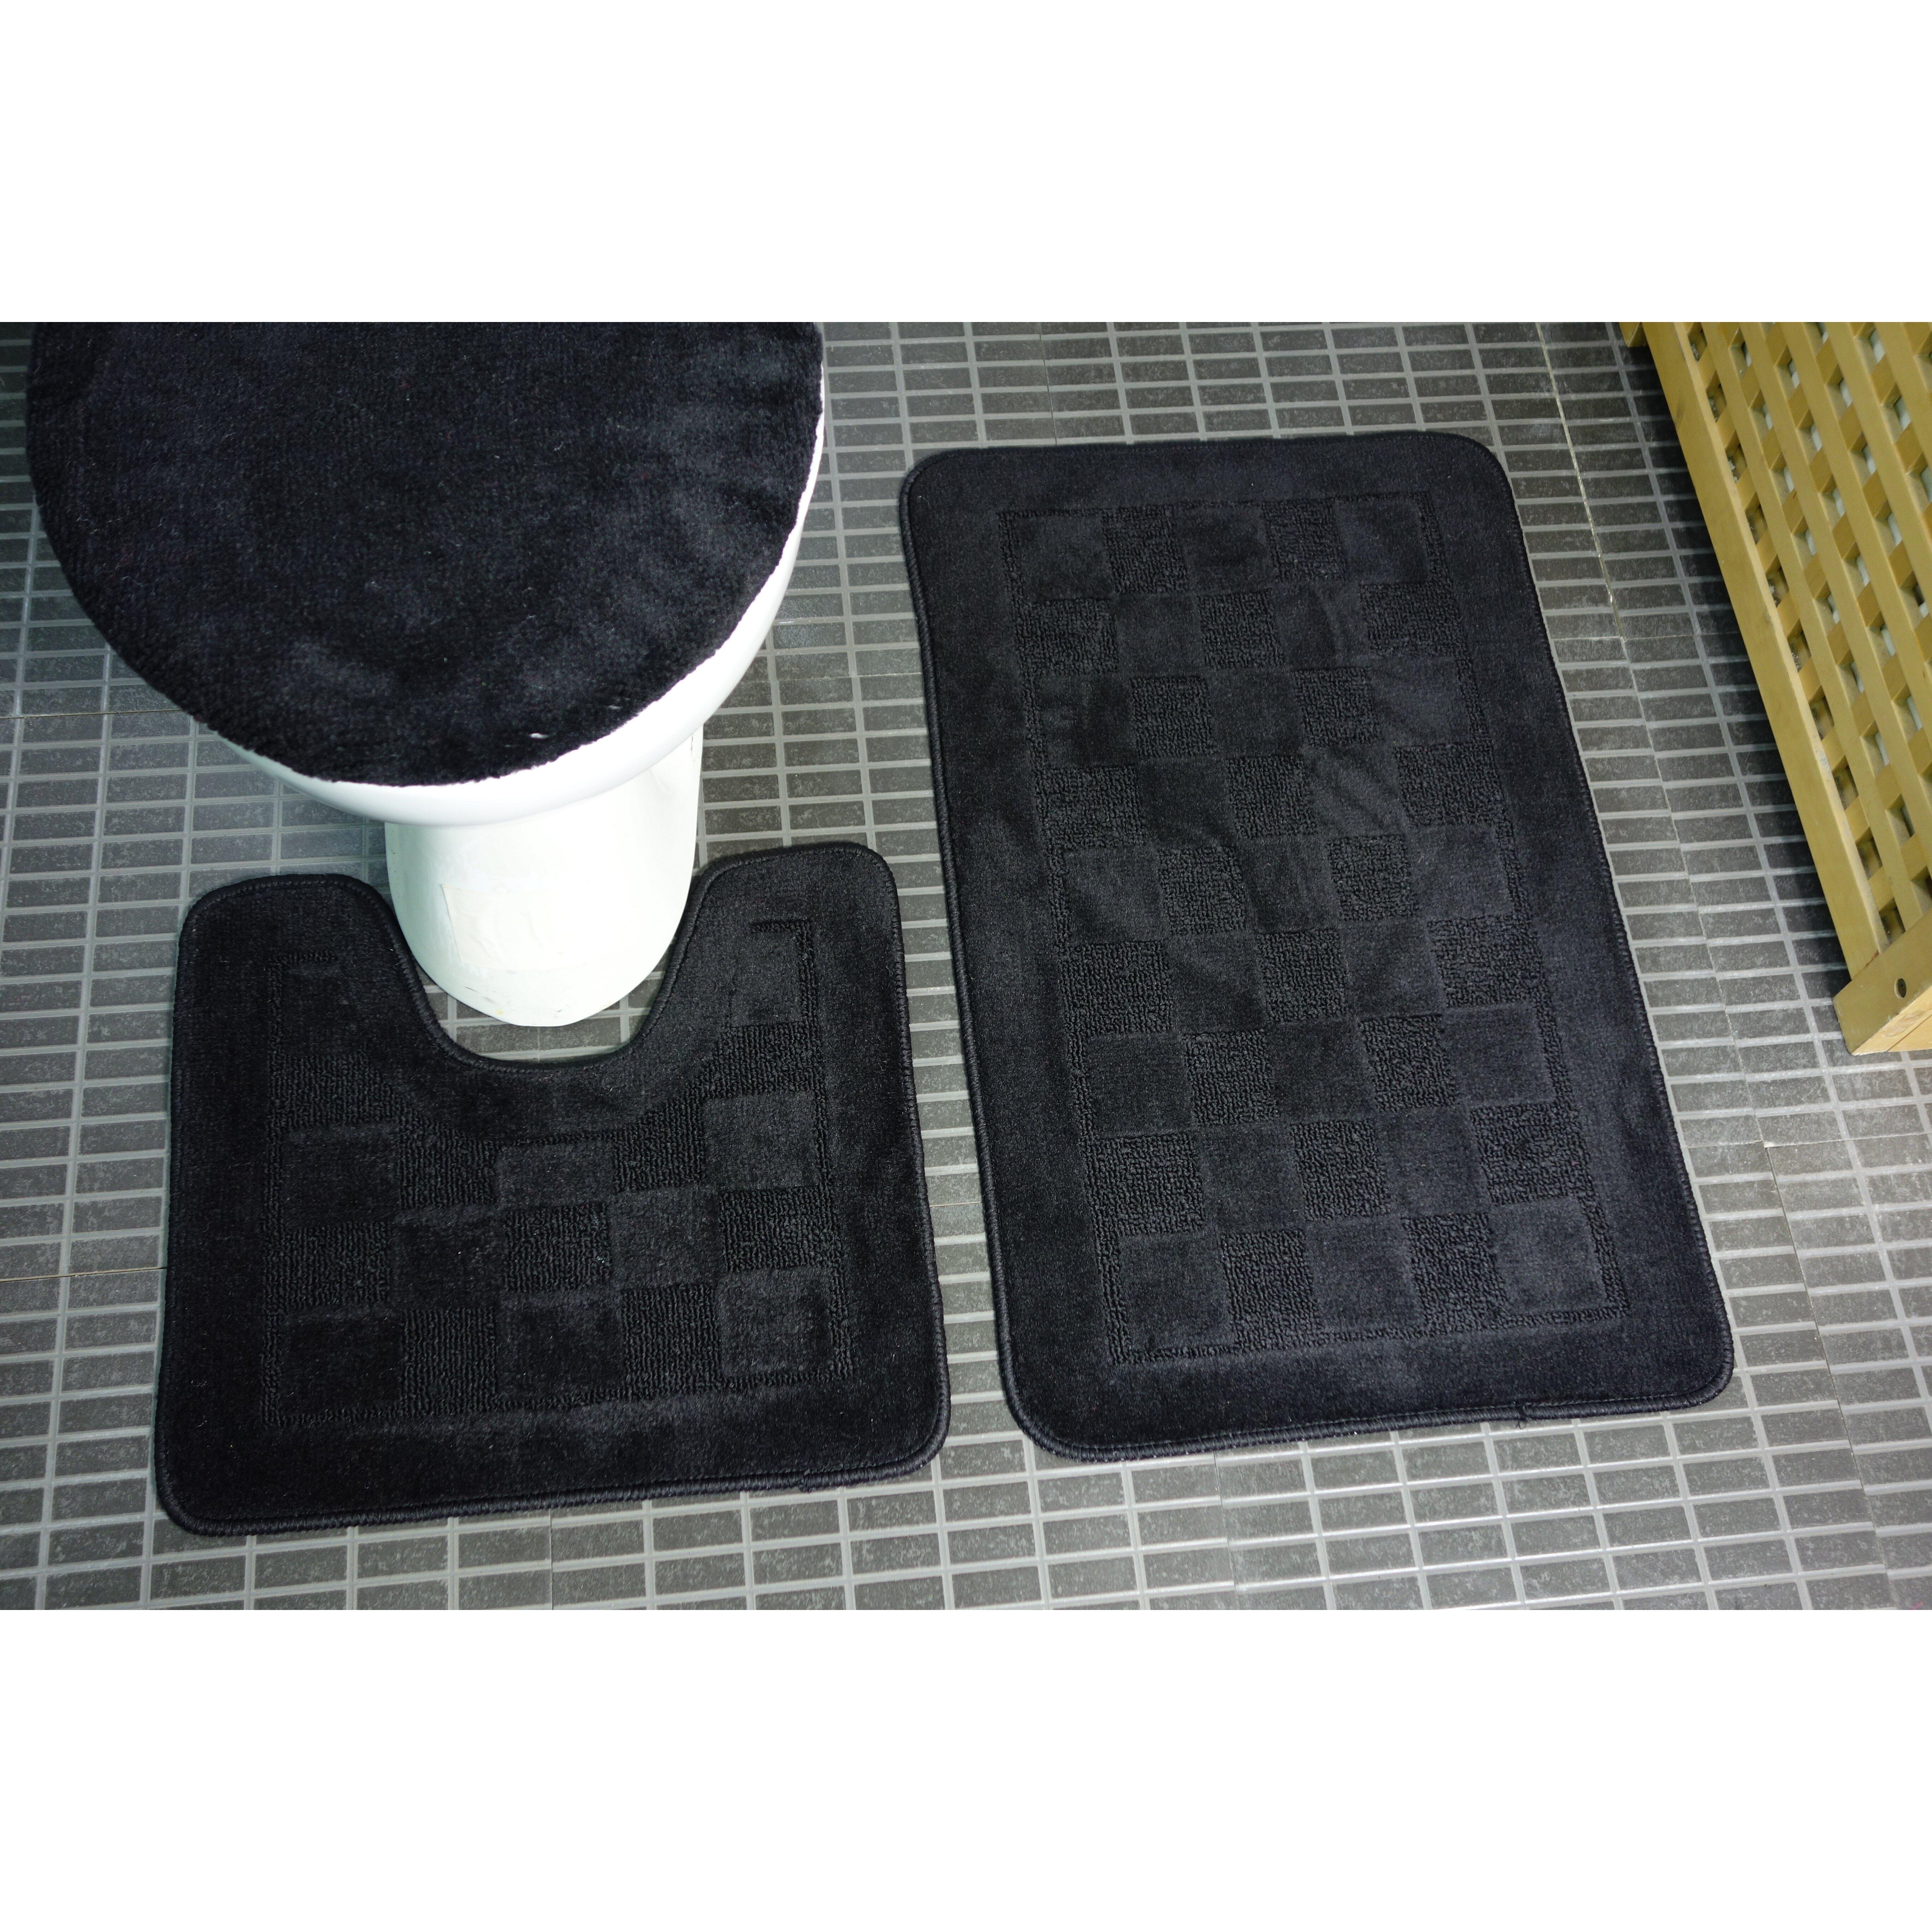 Bathroom Rugs Set Dainty Home 3 Piece Bath Rug Set Reviews Wayfair